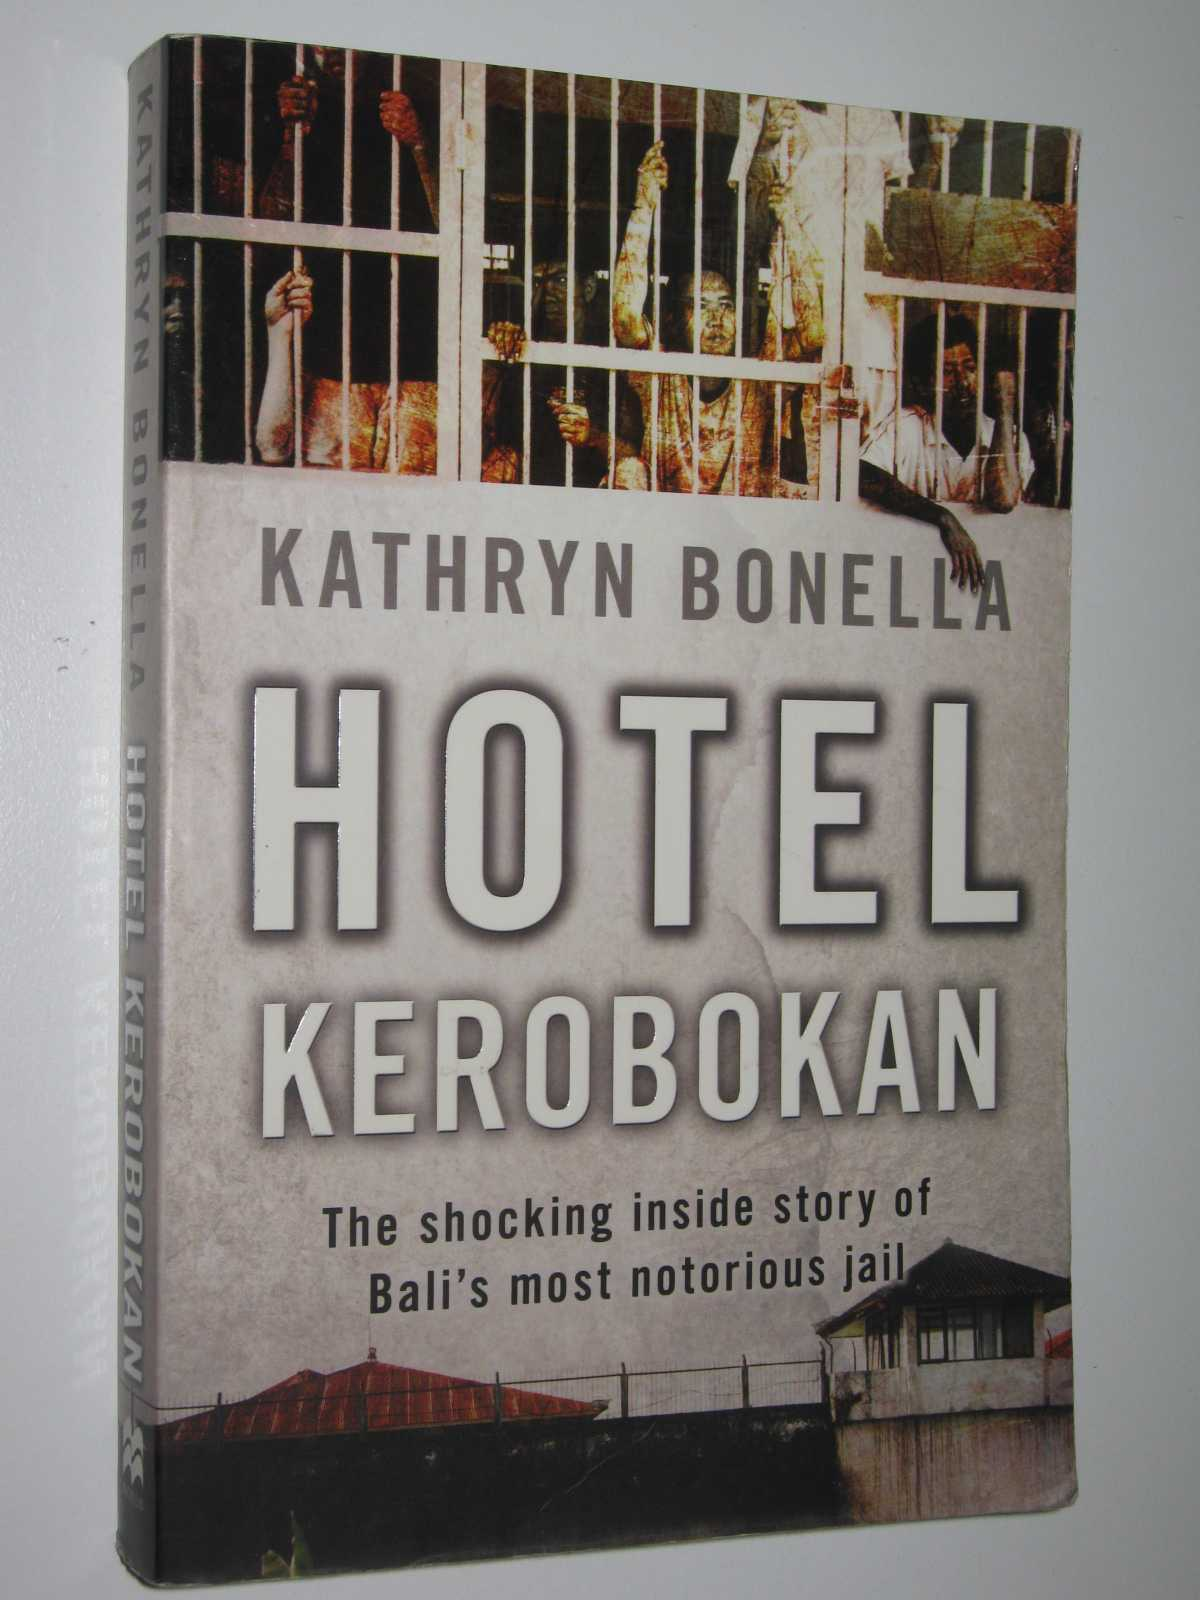 Hotel Kerobkan, Bonella, Kathryn